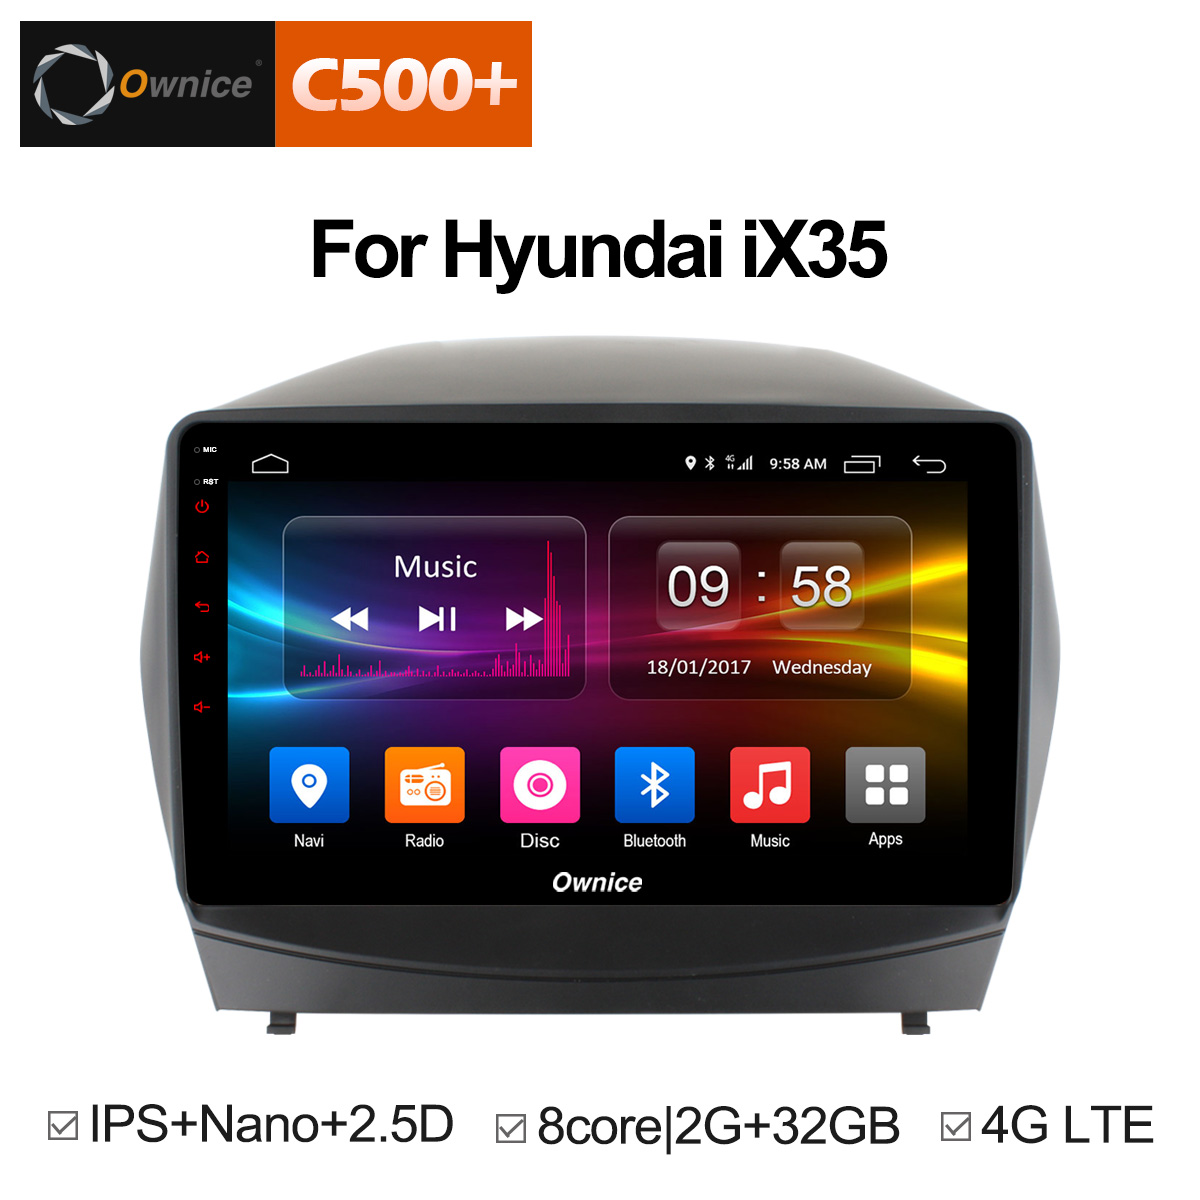 Ownice C500 + G10 Octa Oito Núcleo Android 8.1 rádio Car DVD player GPS para Hyundai iX35 2010-2015 2g RAM 32g Apoio ROM 4g LTE